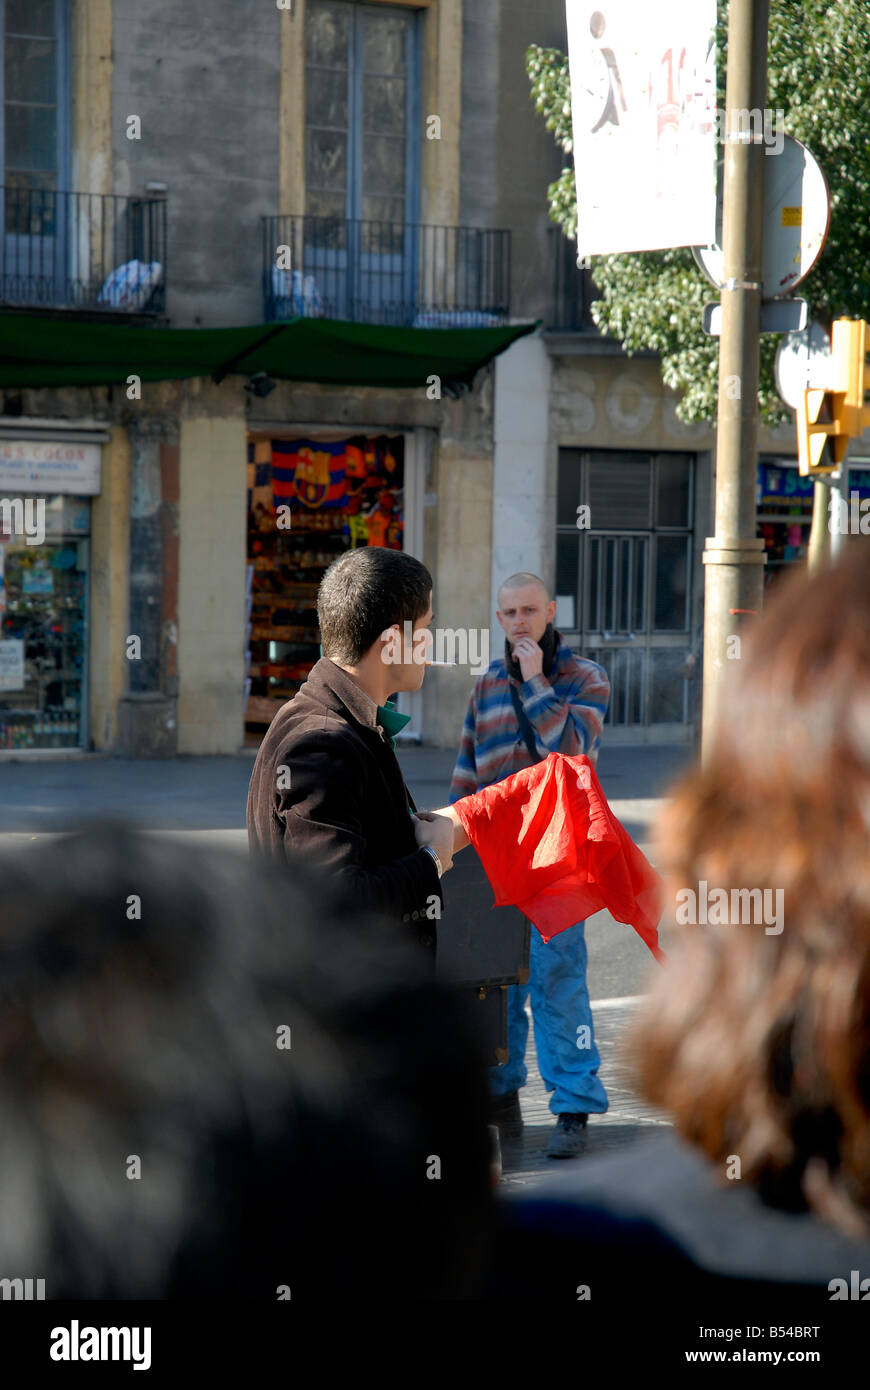 A magician perform live tricks on Las Ramblas - Stock Image